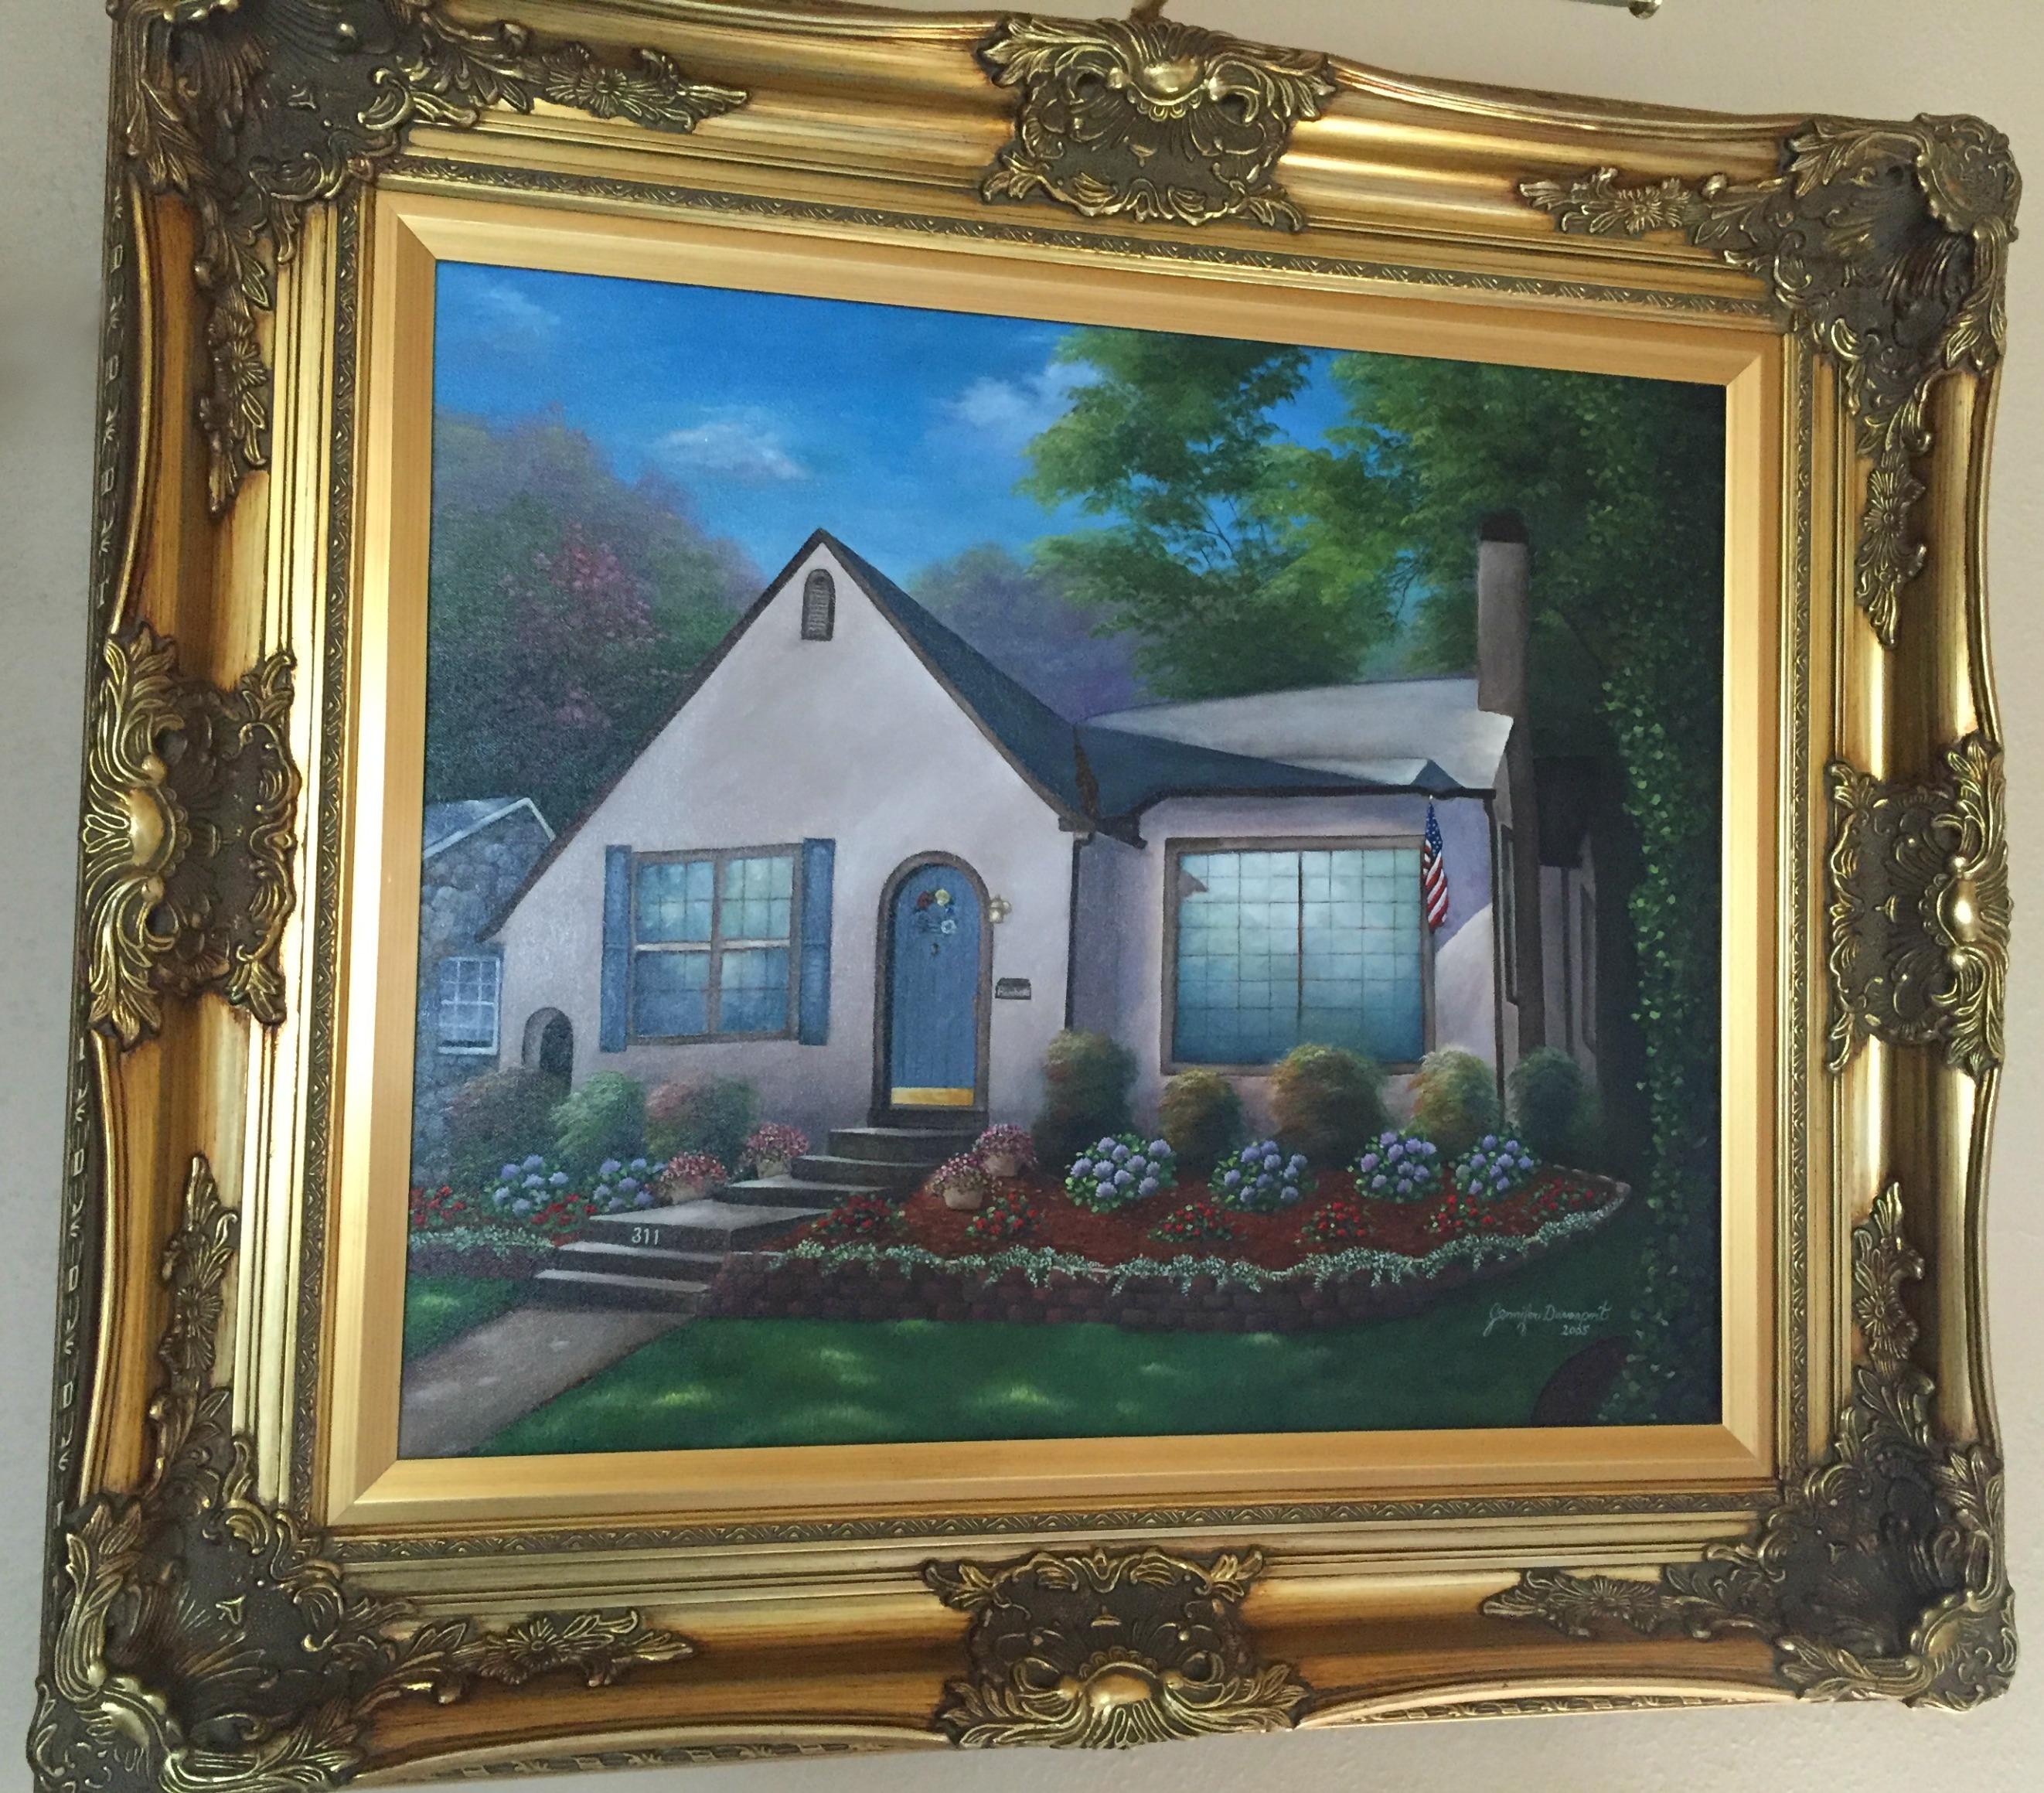 Grandma's House from Jennifer Decorates.com